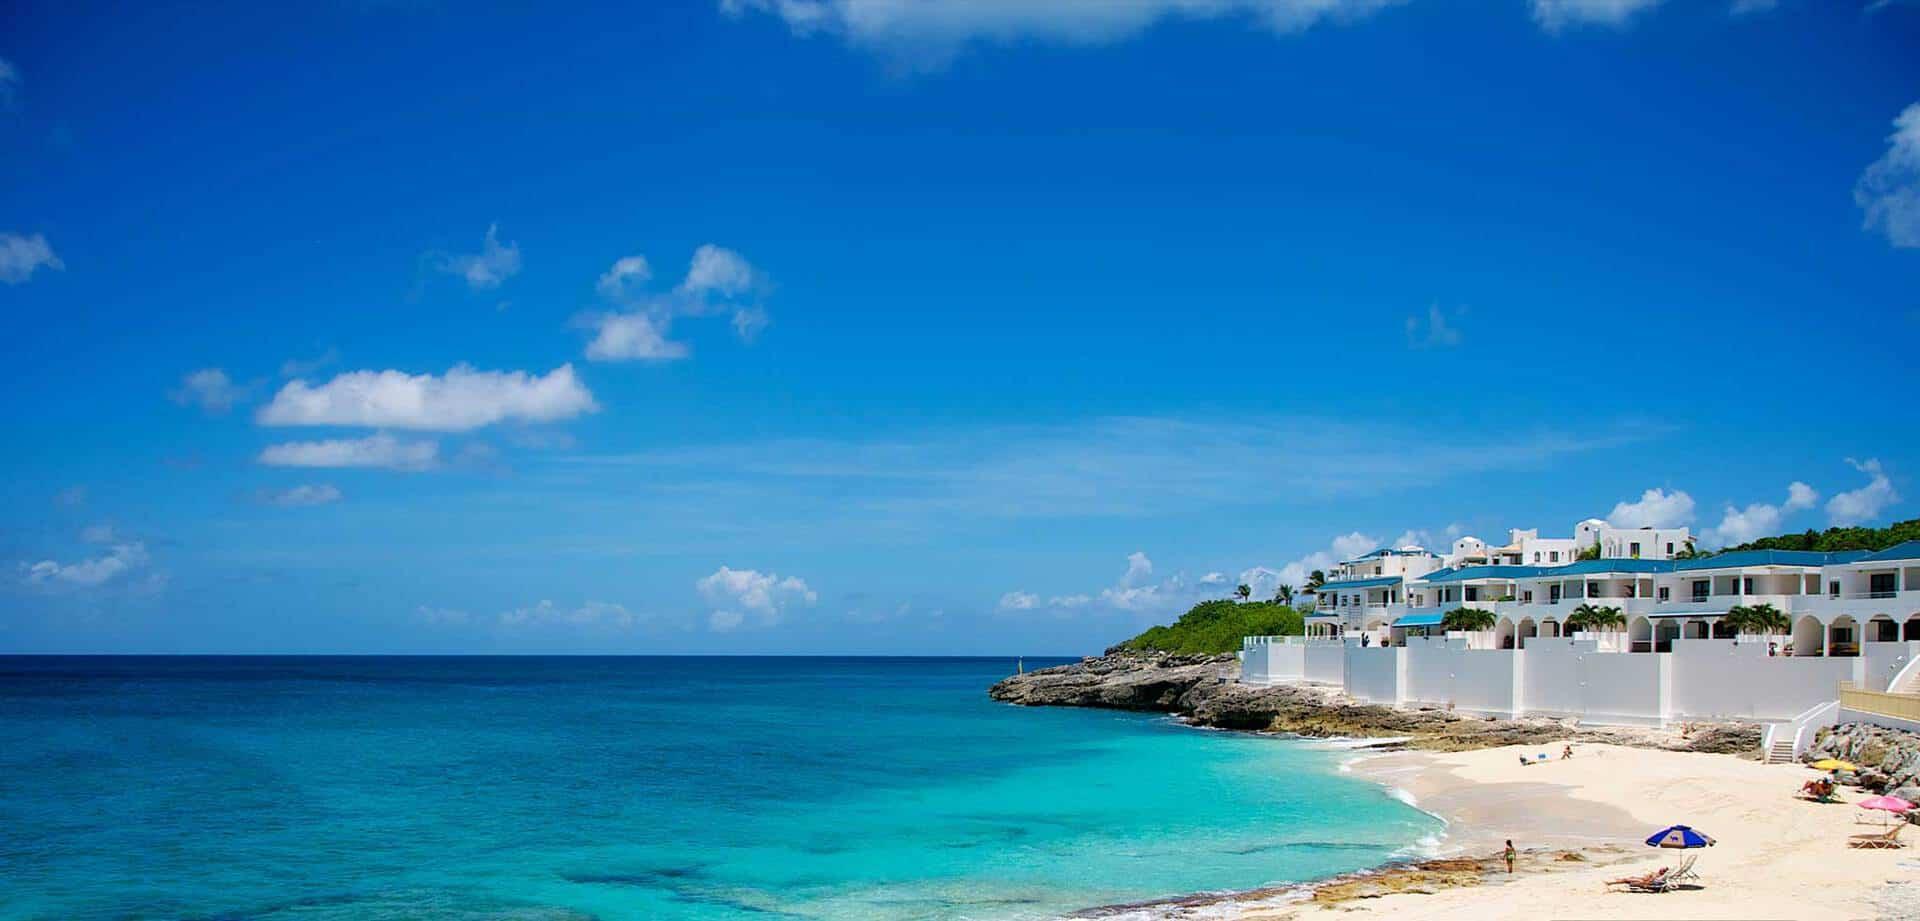 Cupecoy-Beach-St-Maarten1